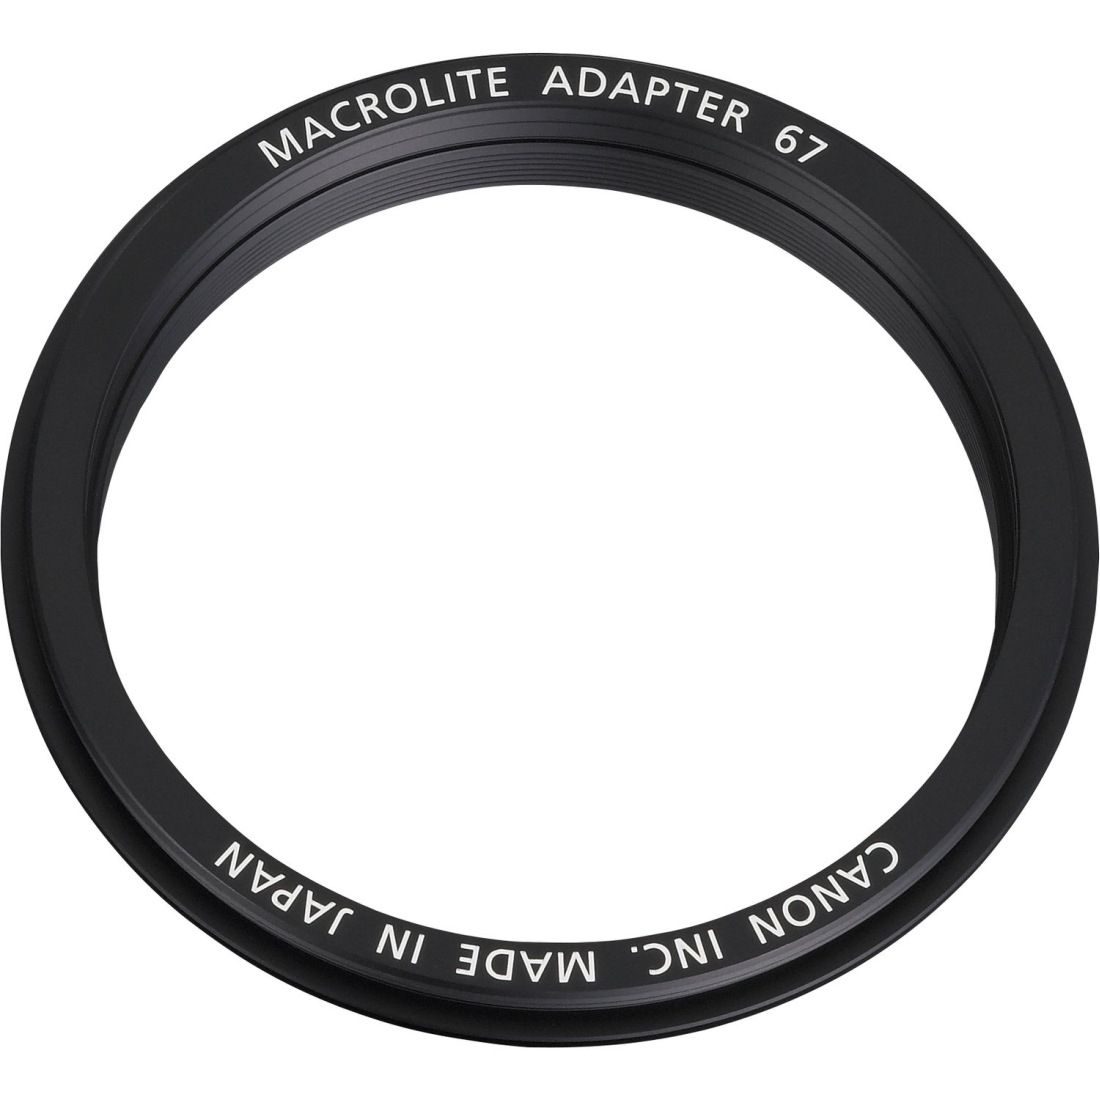 CANON Macrolite Adapter 67